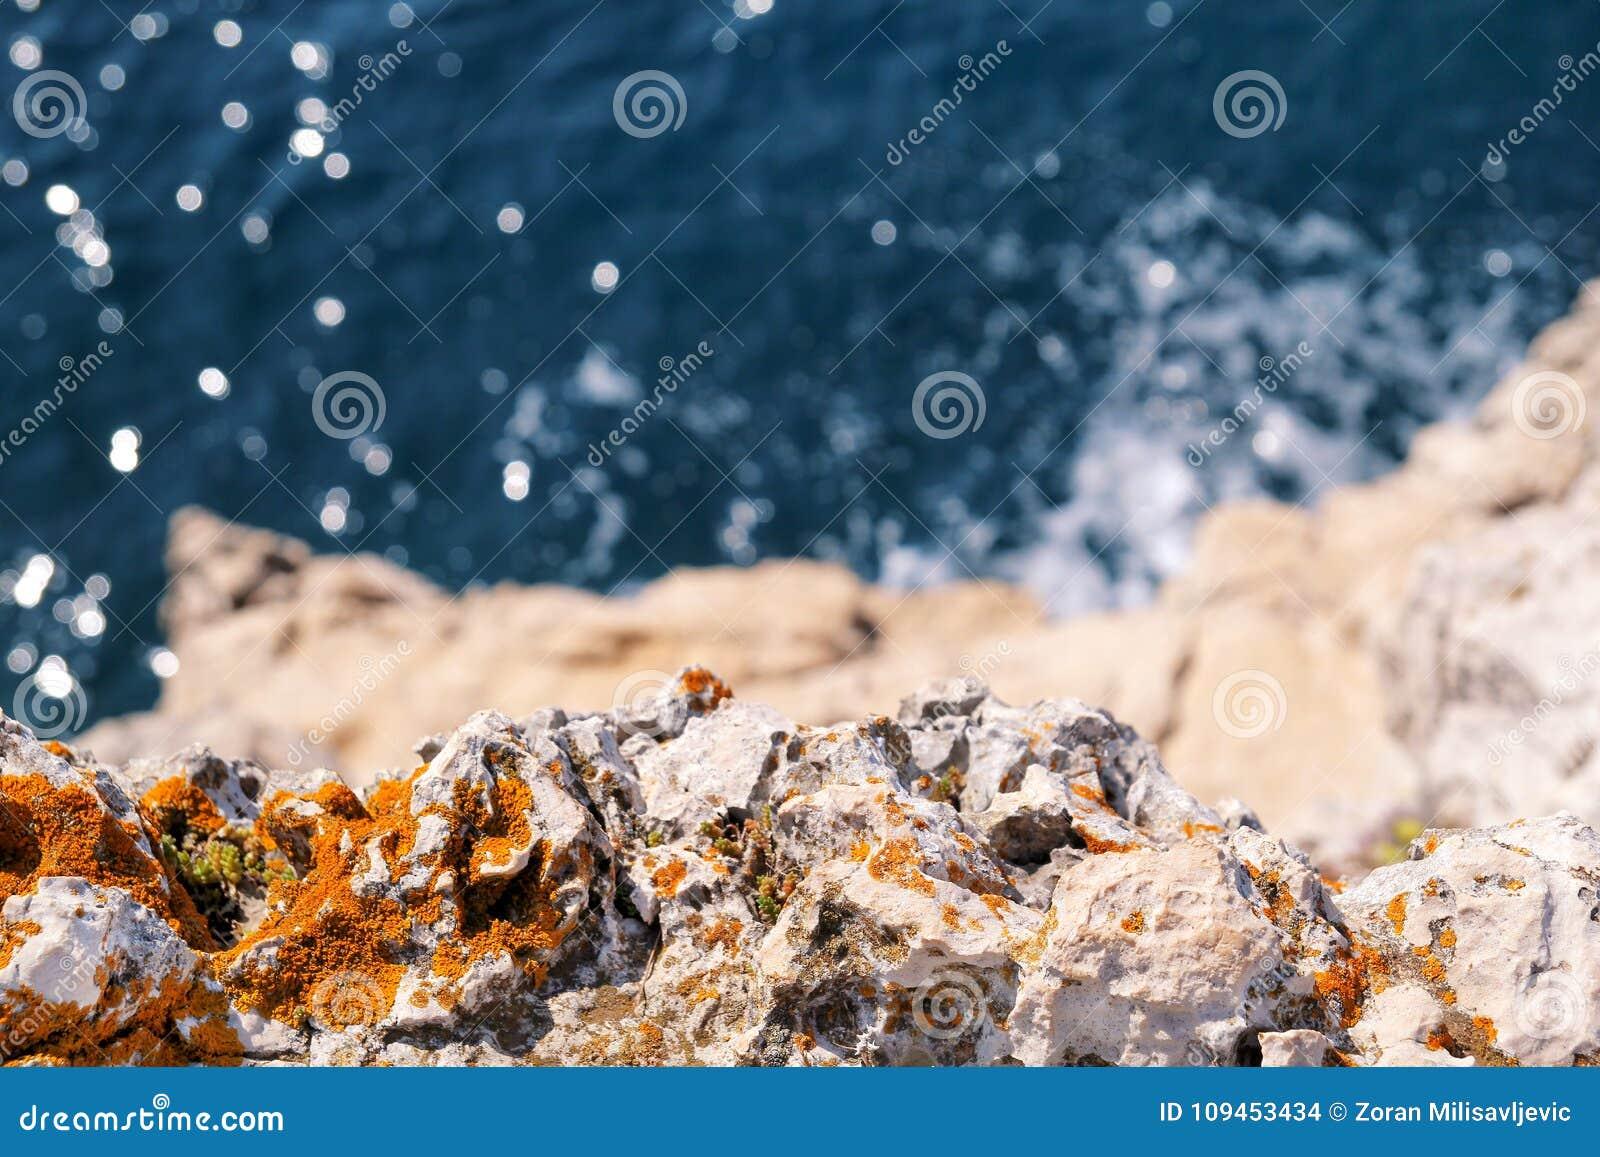 Rocks at seashore of Adriatic sea, Mediterranean, closeup. Aerial top view of sea waves hitting rocks on the beach.